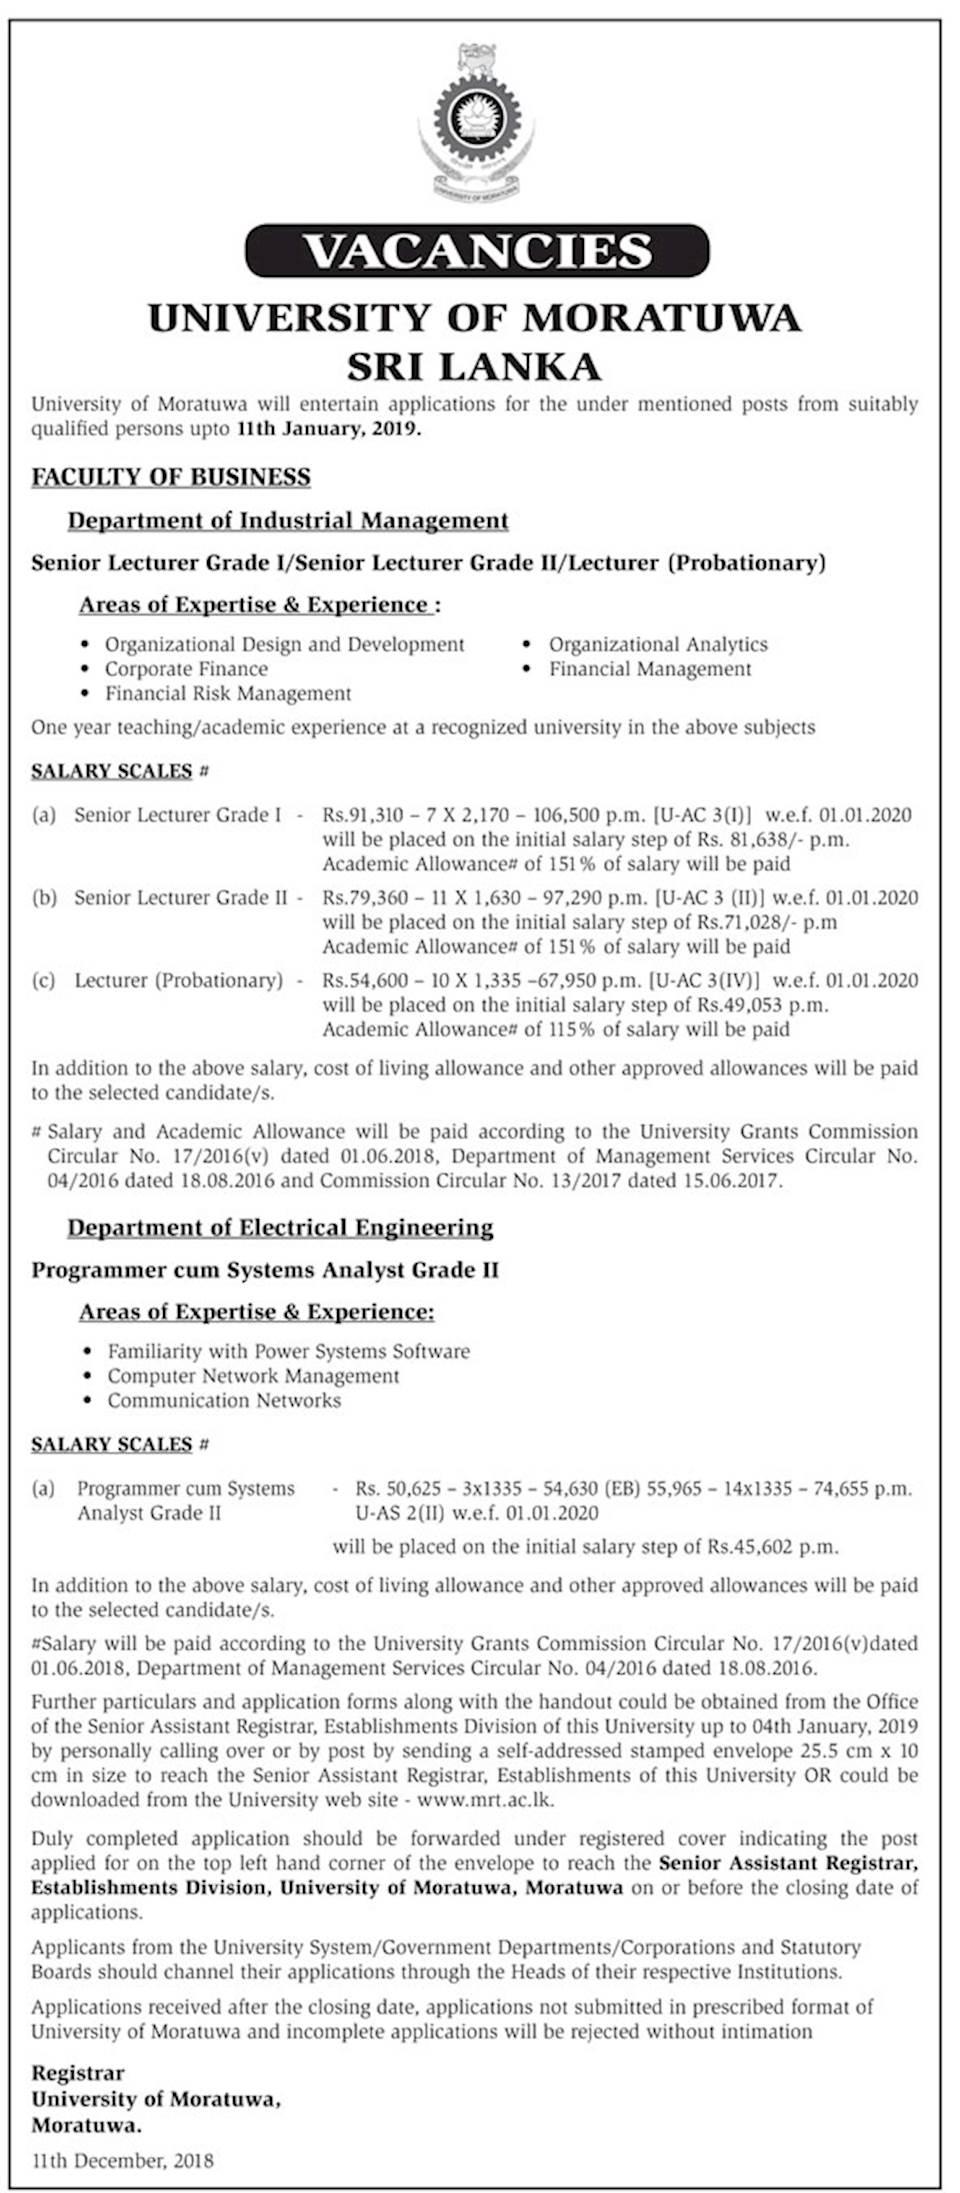 Vacancies at University of Moratuwa